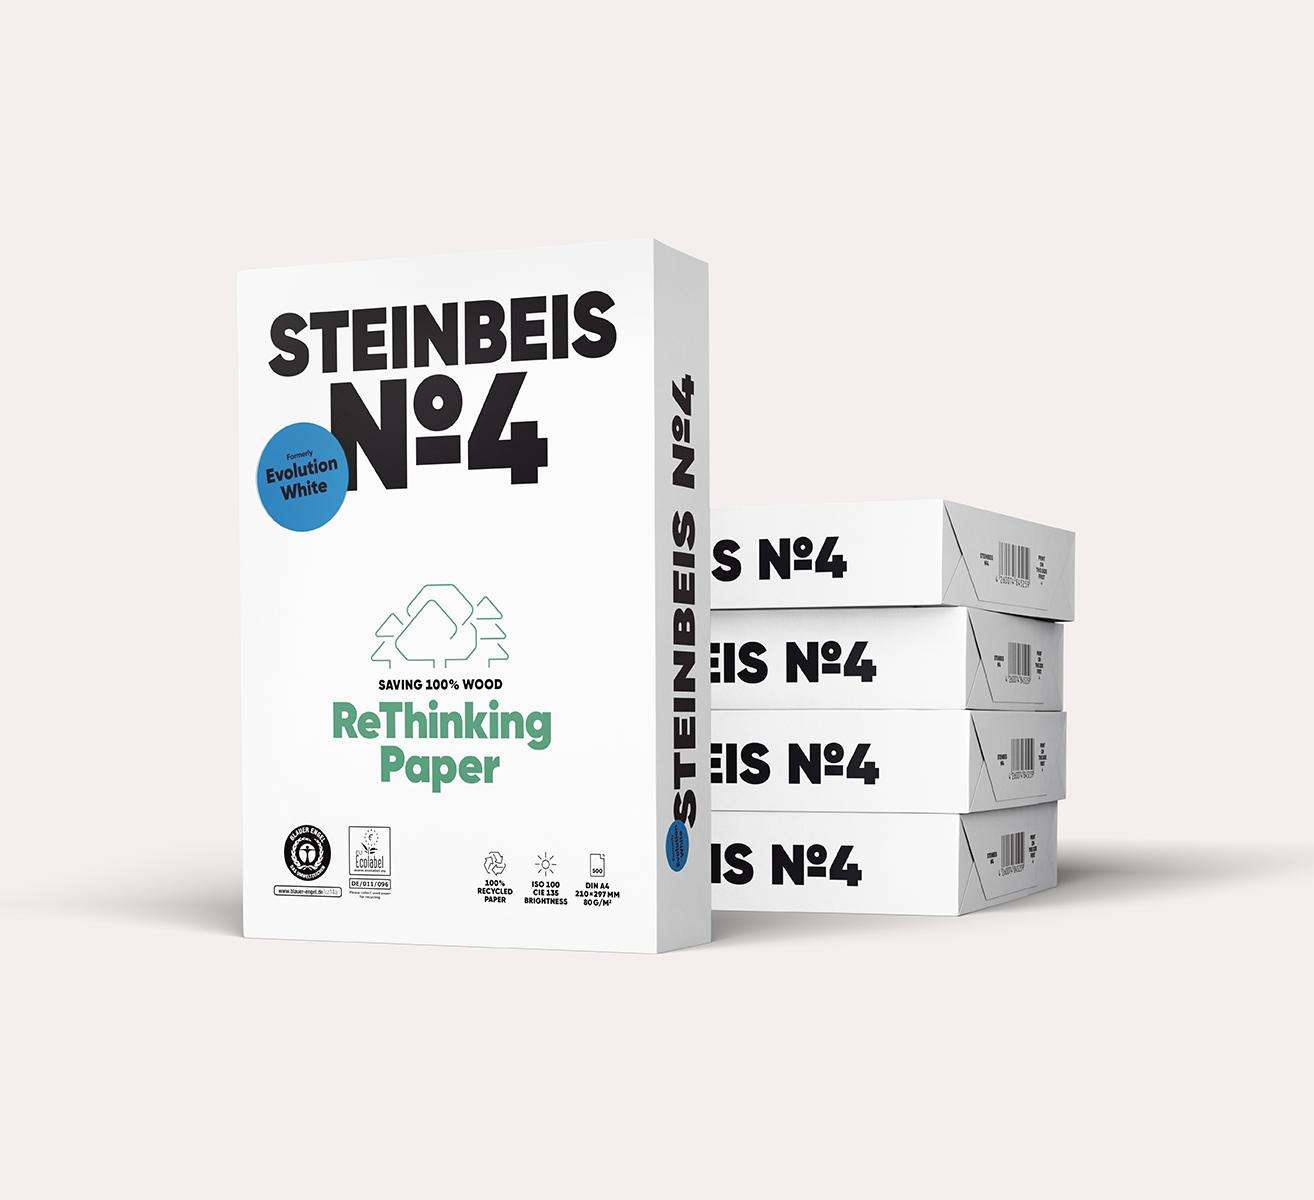 Steinbeis №4